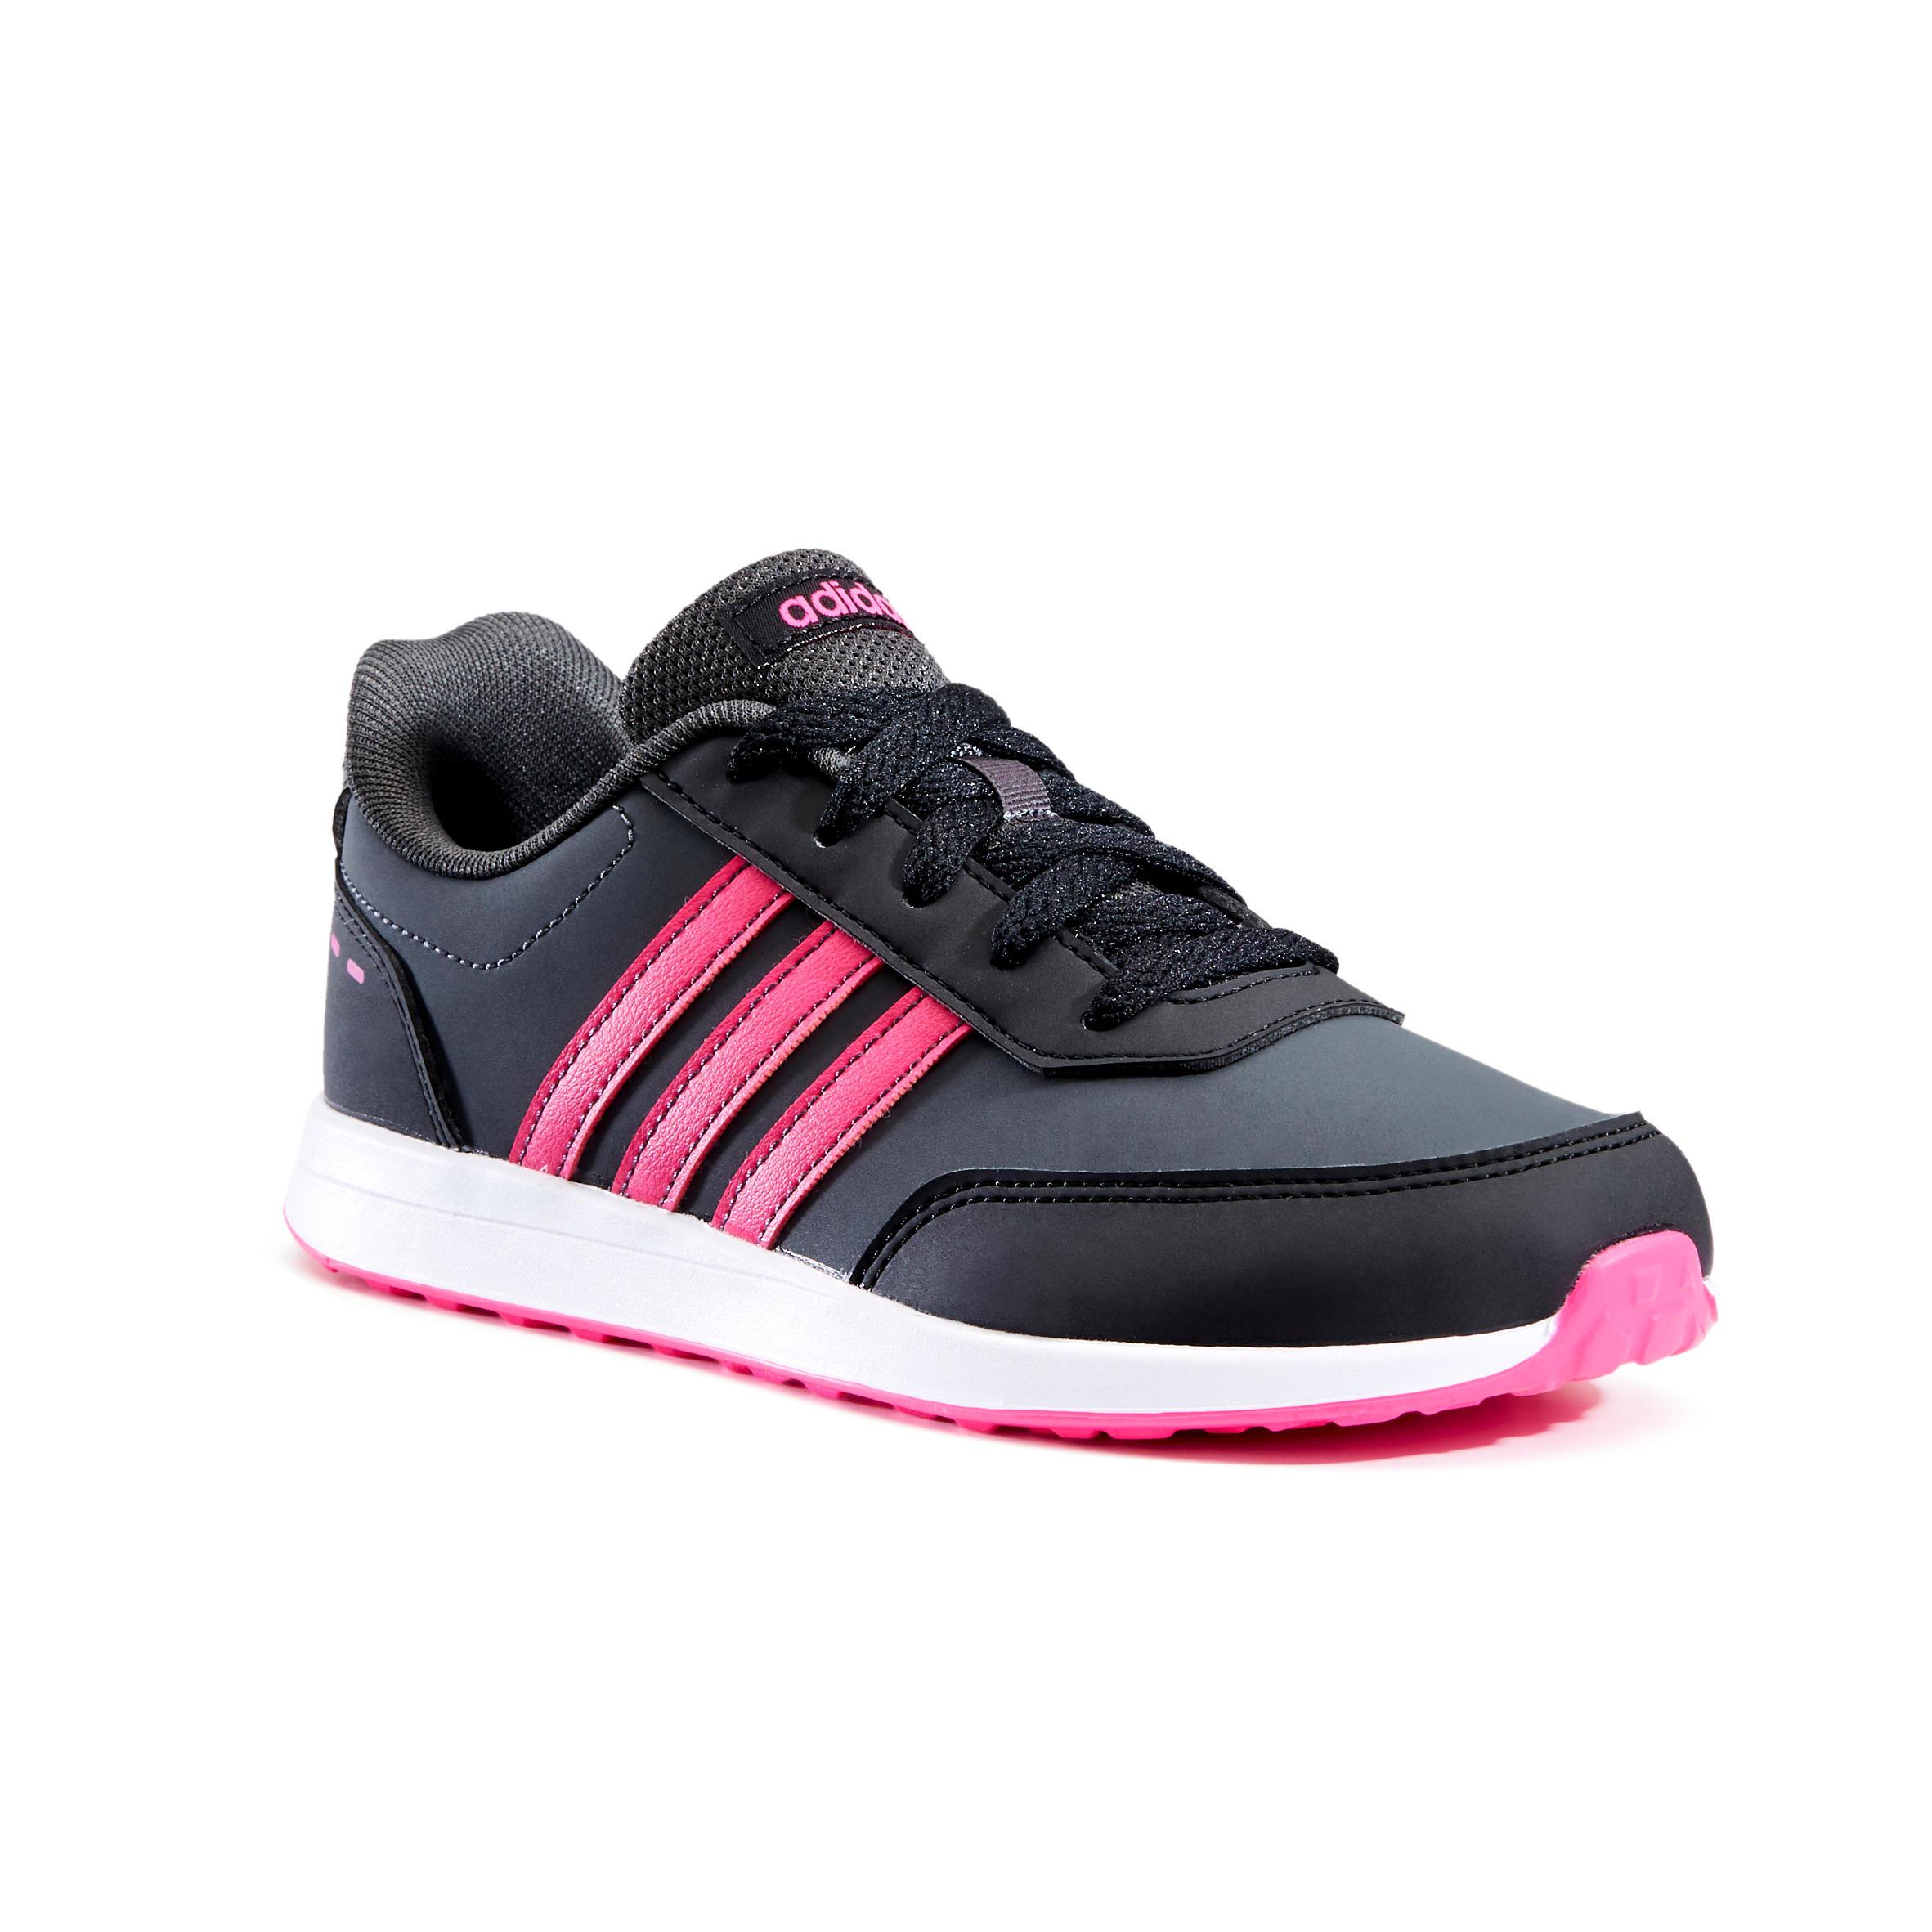 adidas shoe laces grey